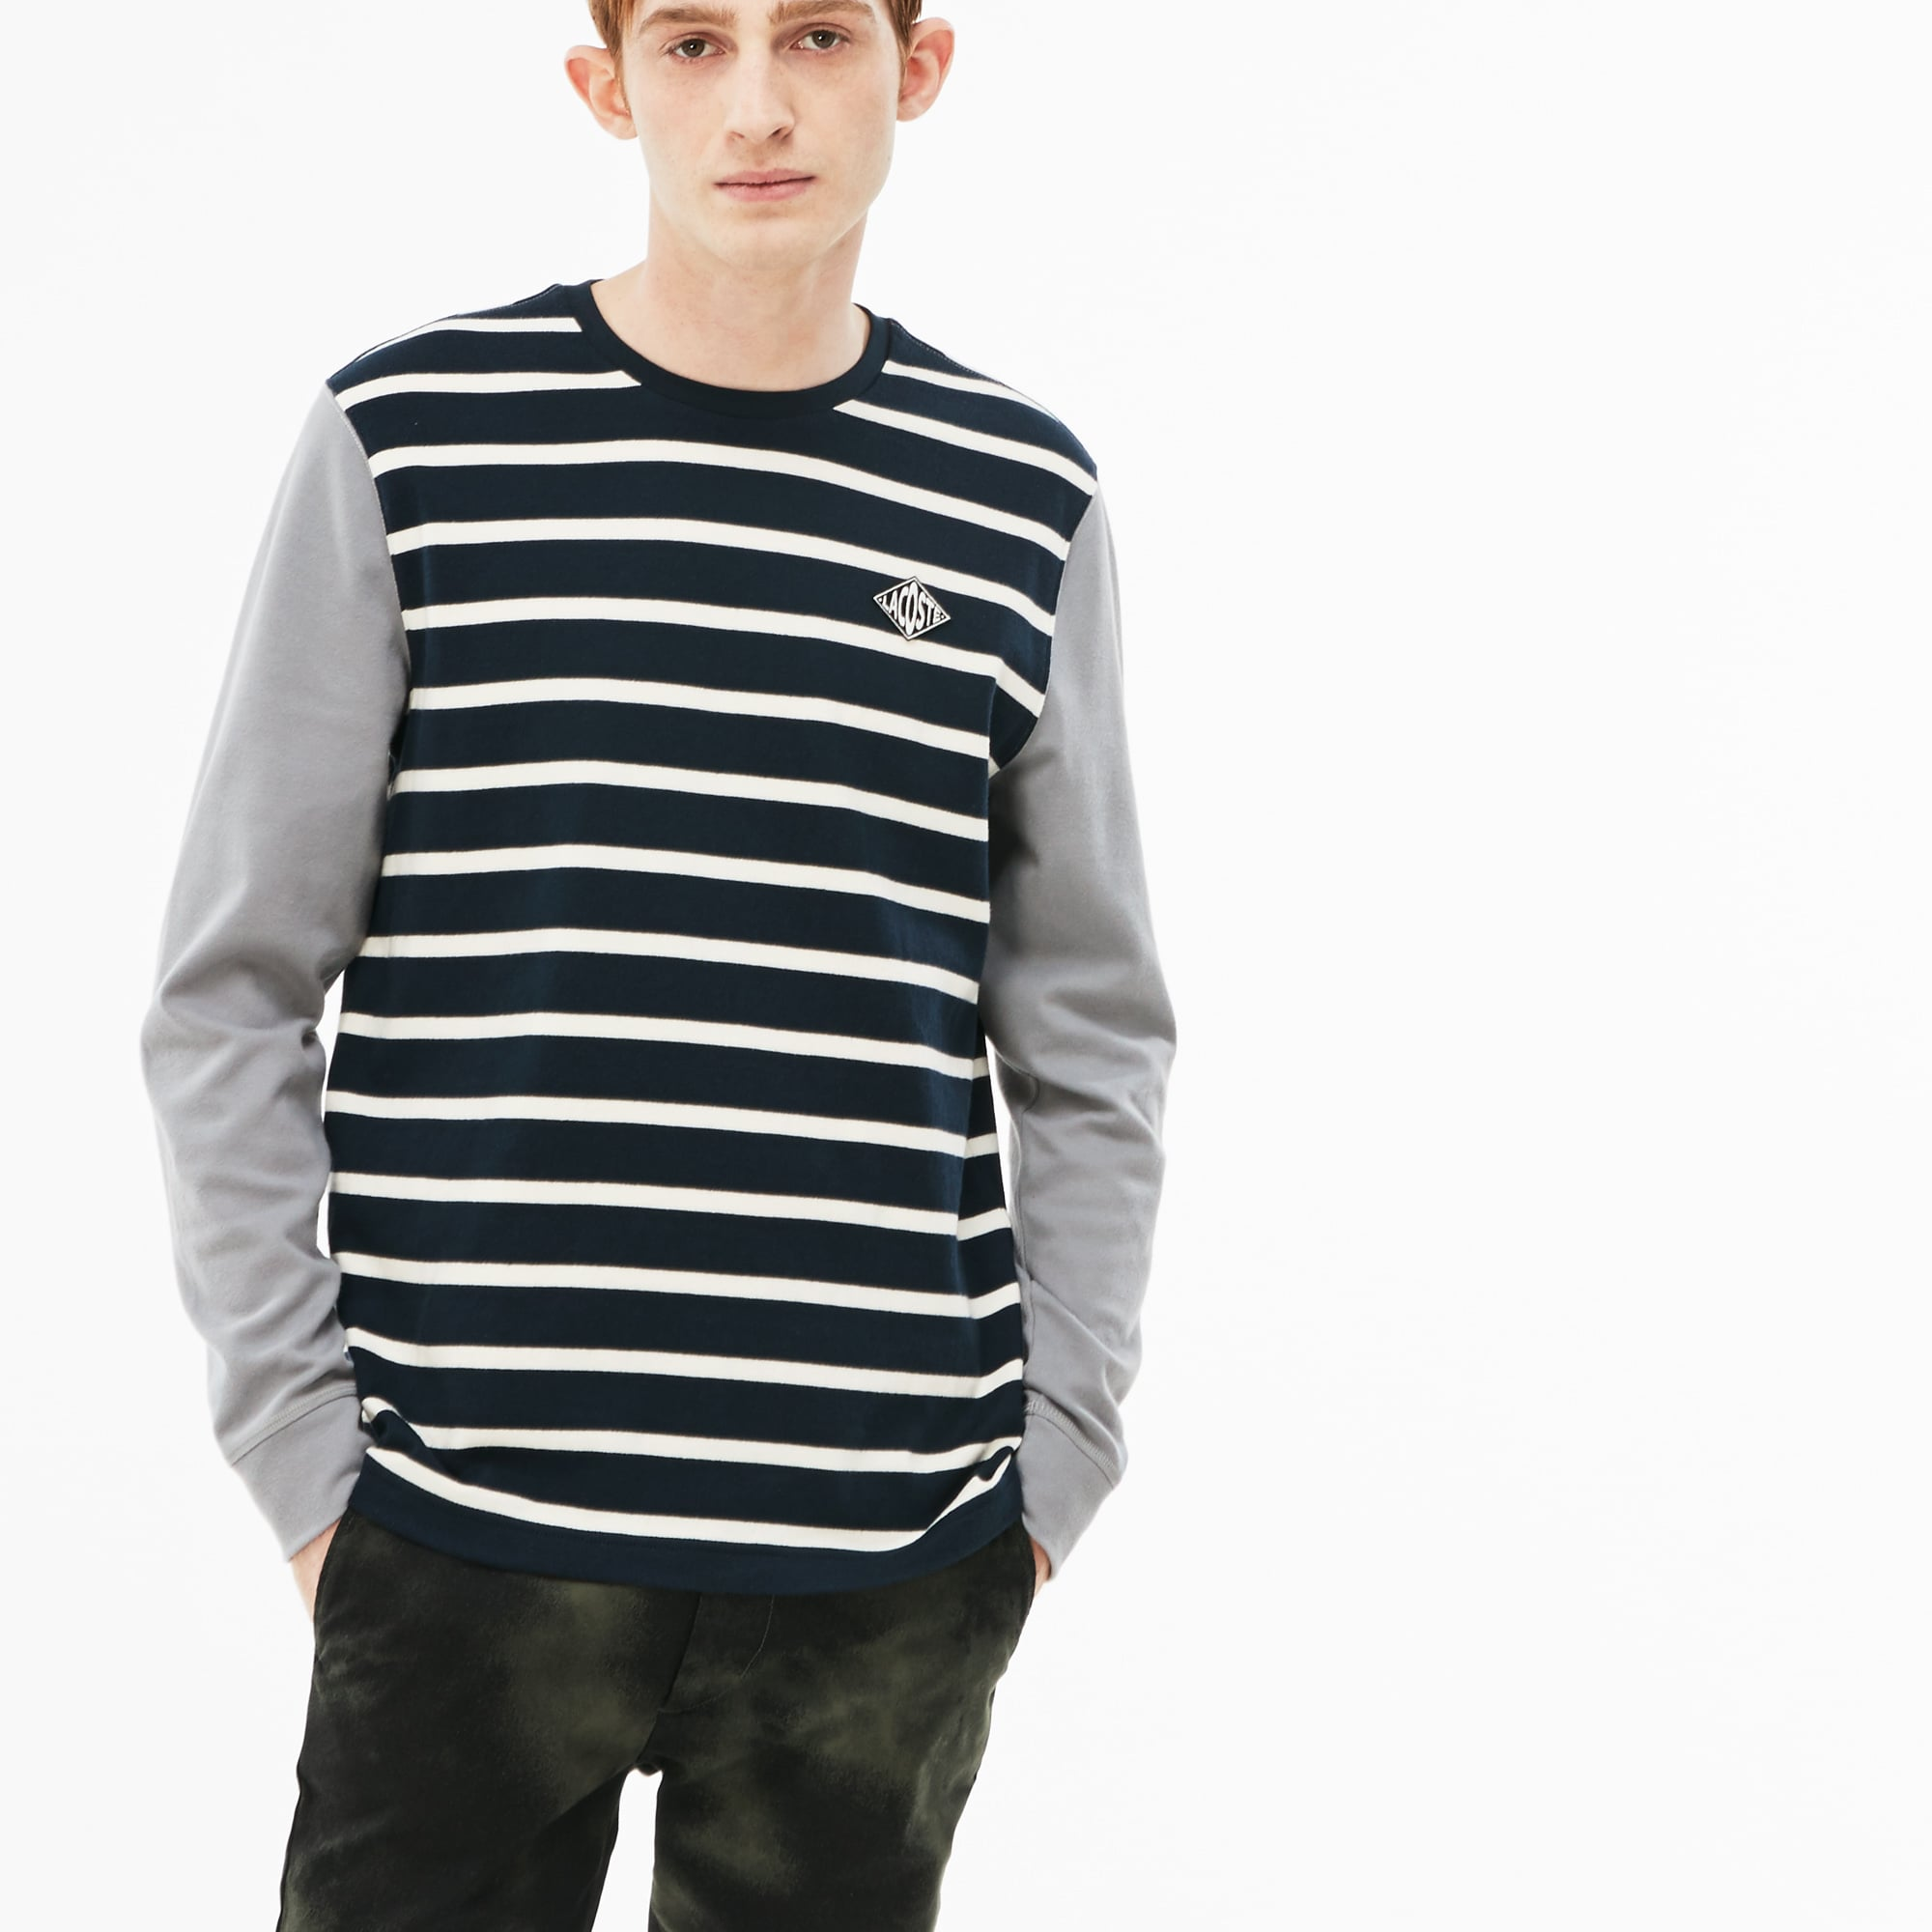 Men's LIVE Striped Cotton Jersey T-shirt